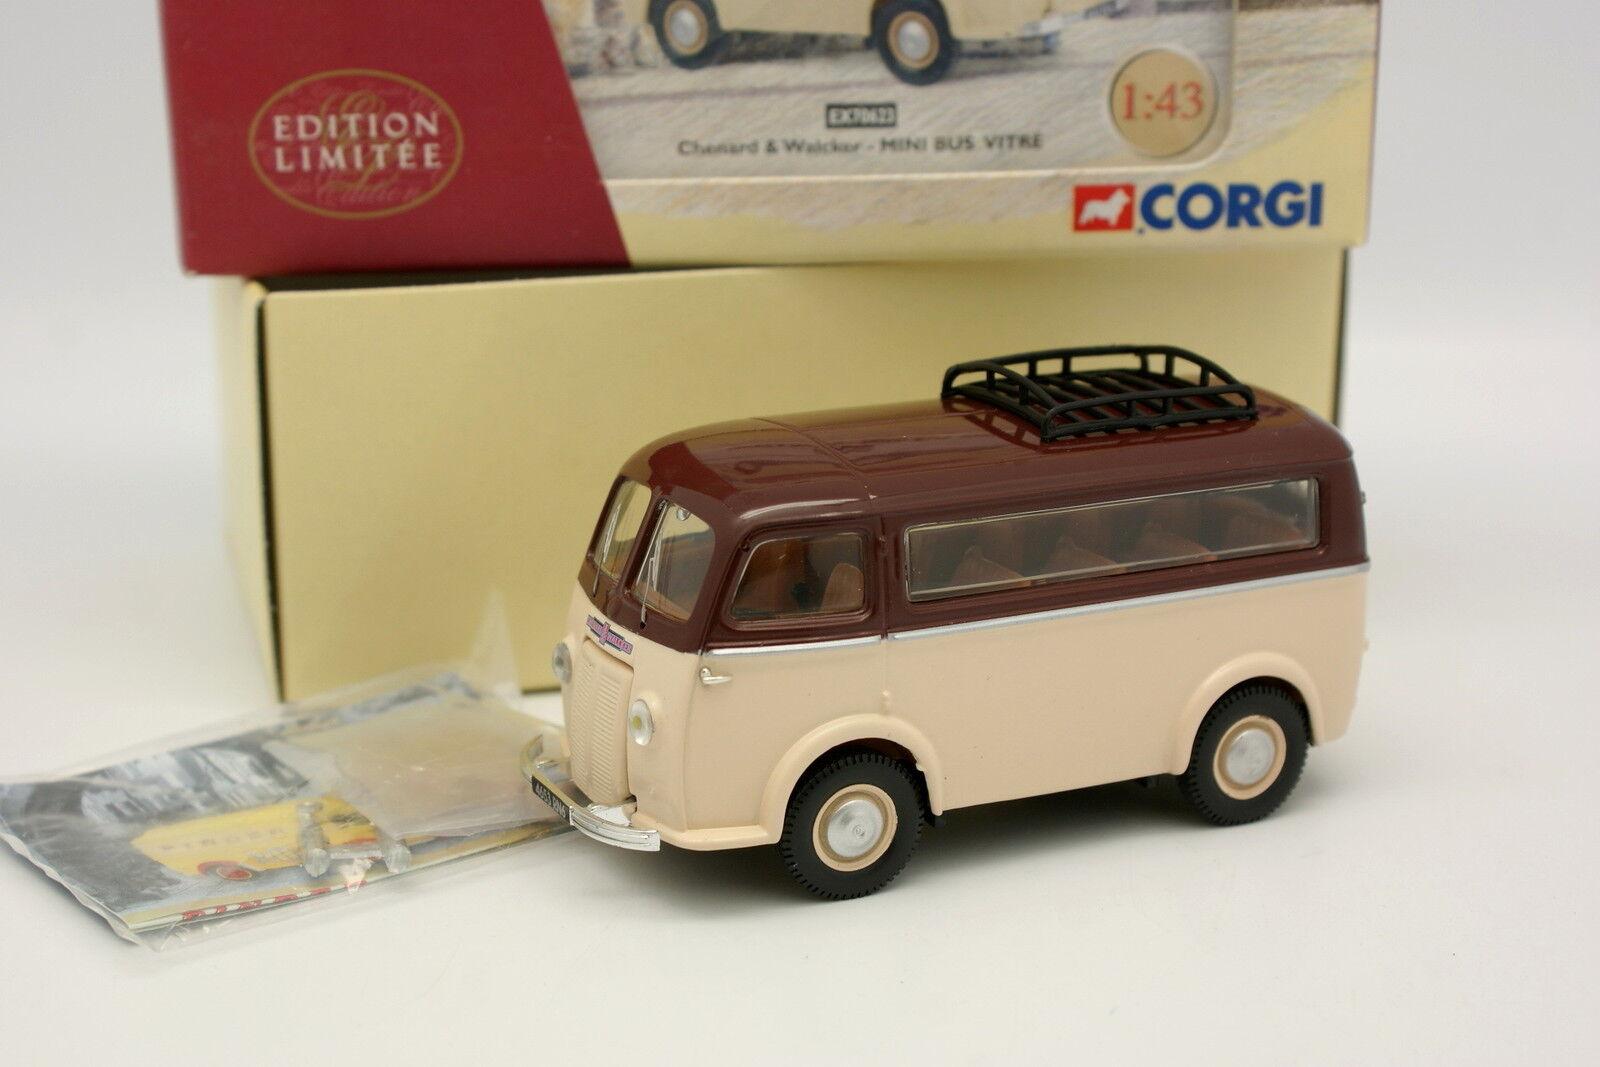 Corgi heritage 1 43 - CHENARD and Walker Mini Bus glass